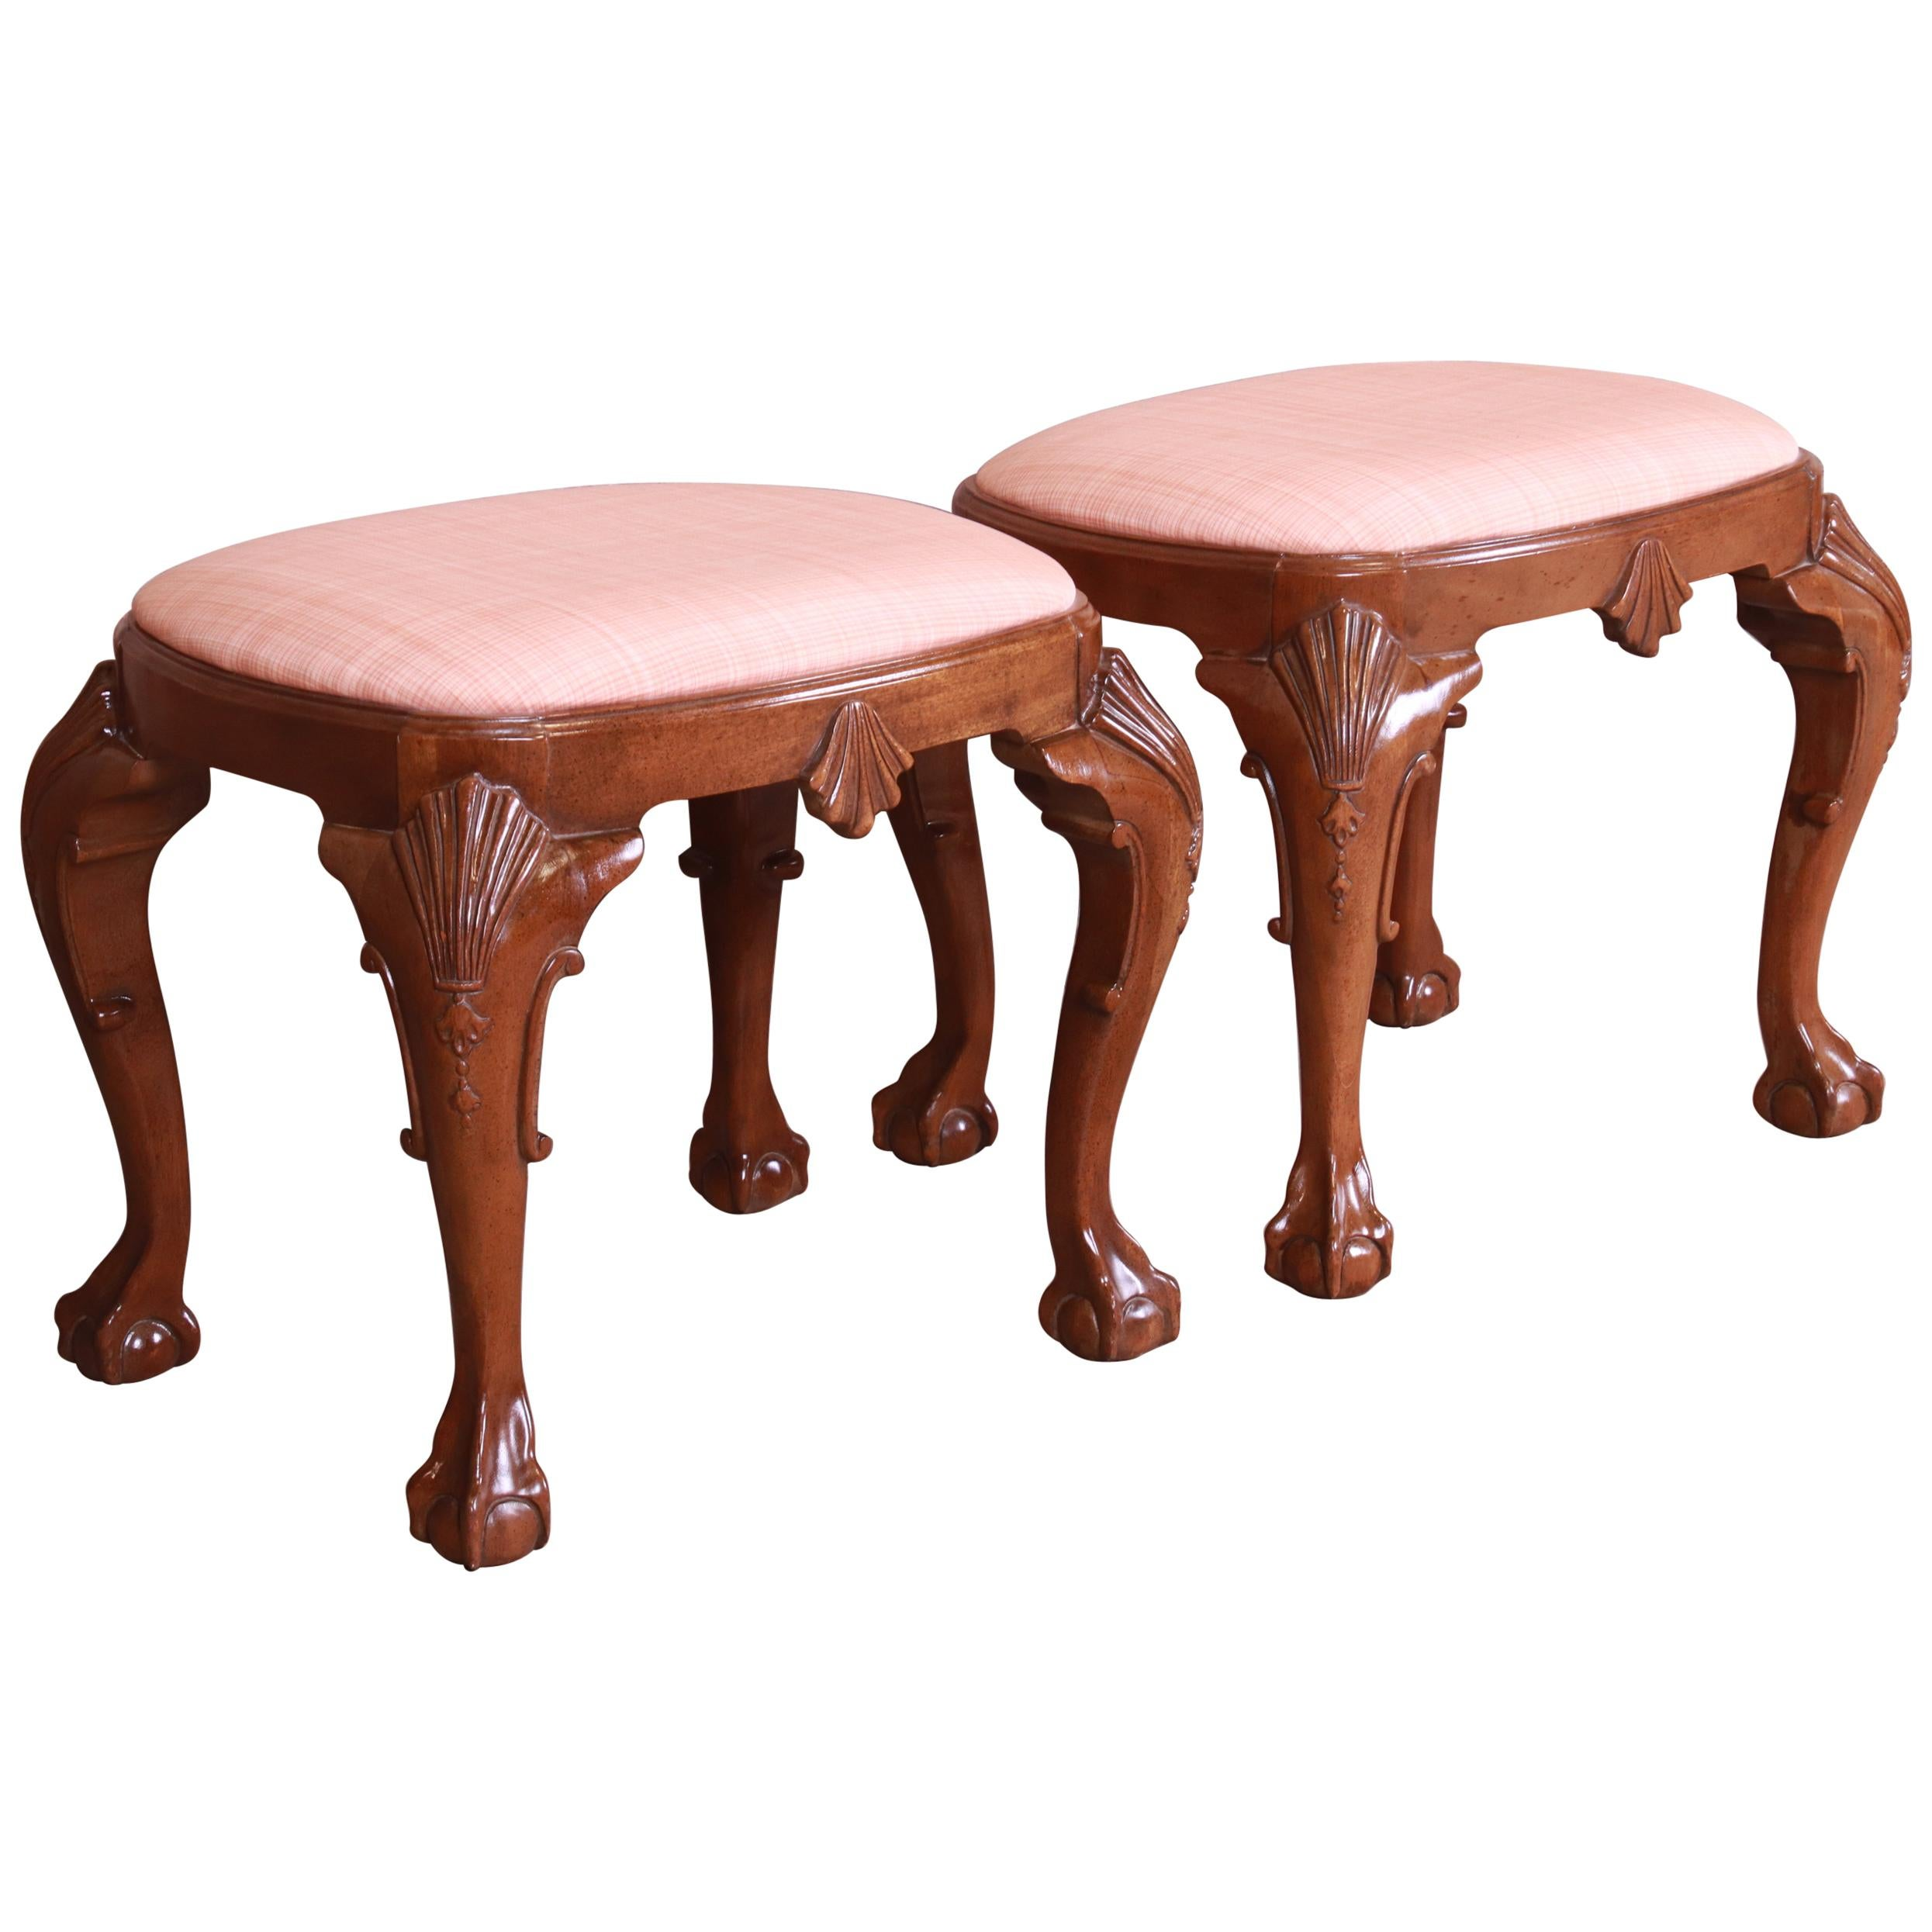 Baker Furniture Historic Charleston Chippendale Carved Mahogany Stools, Pair